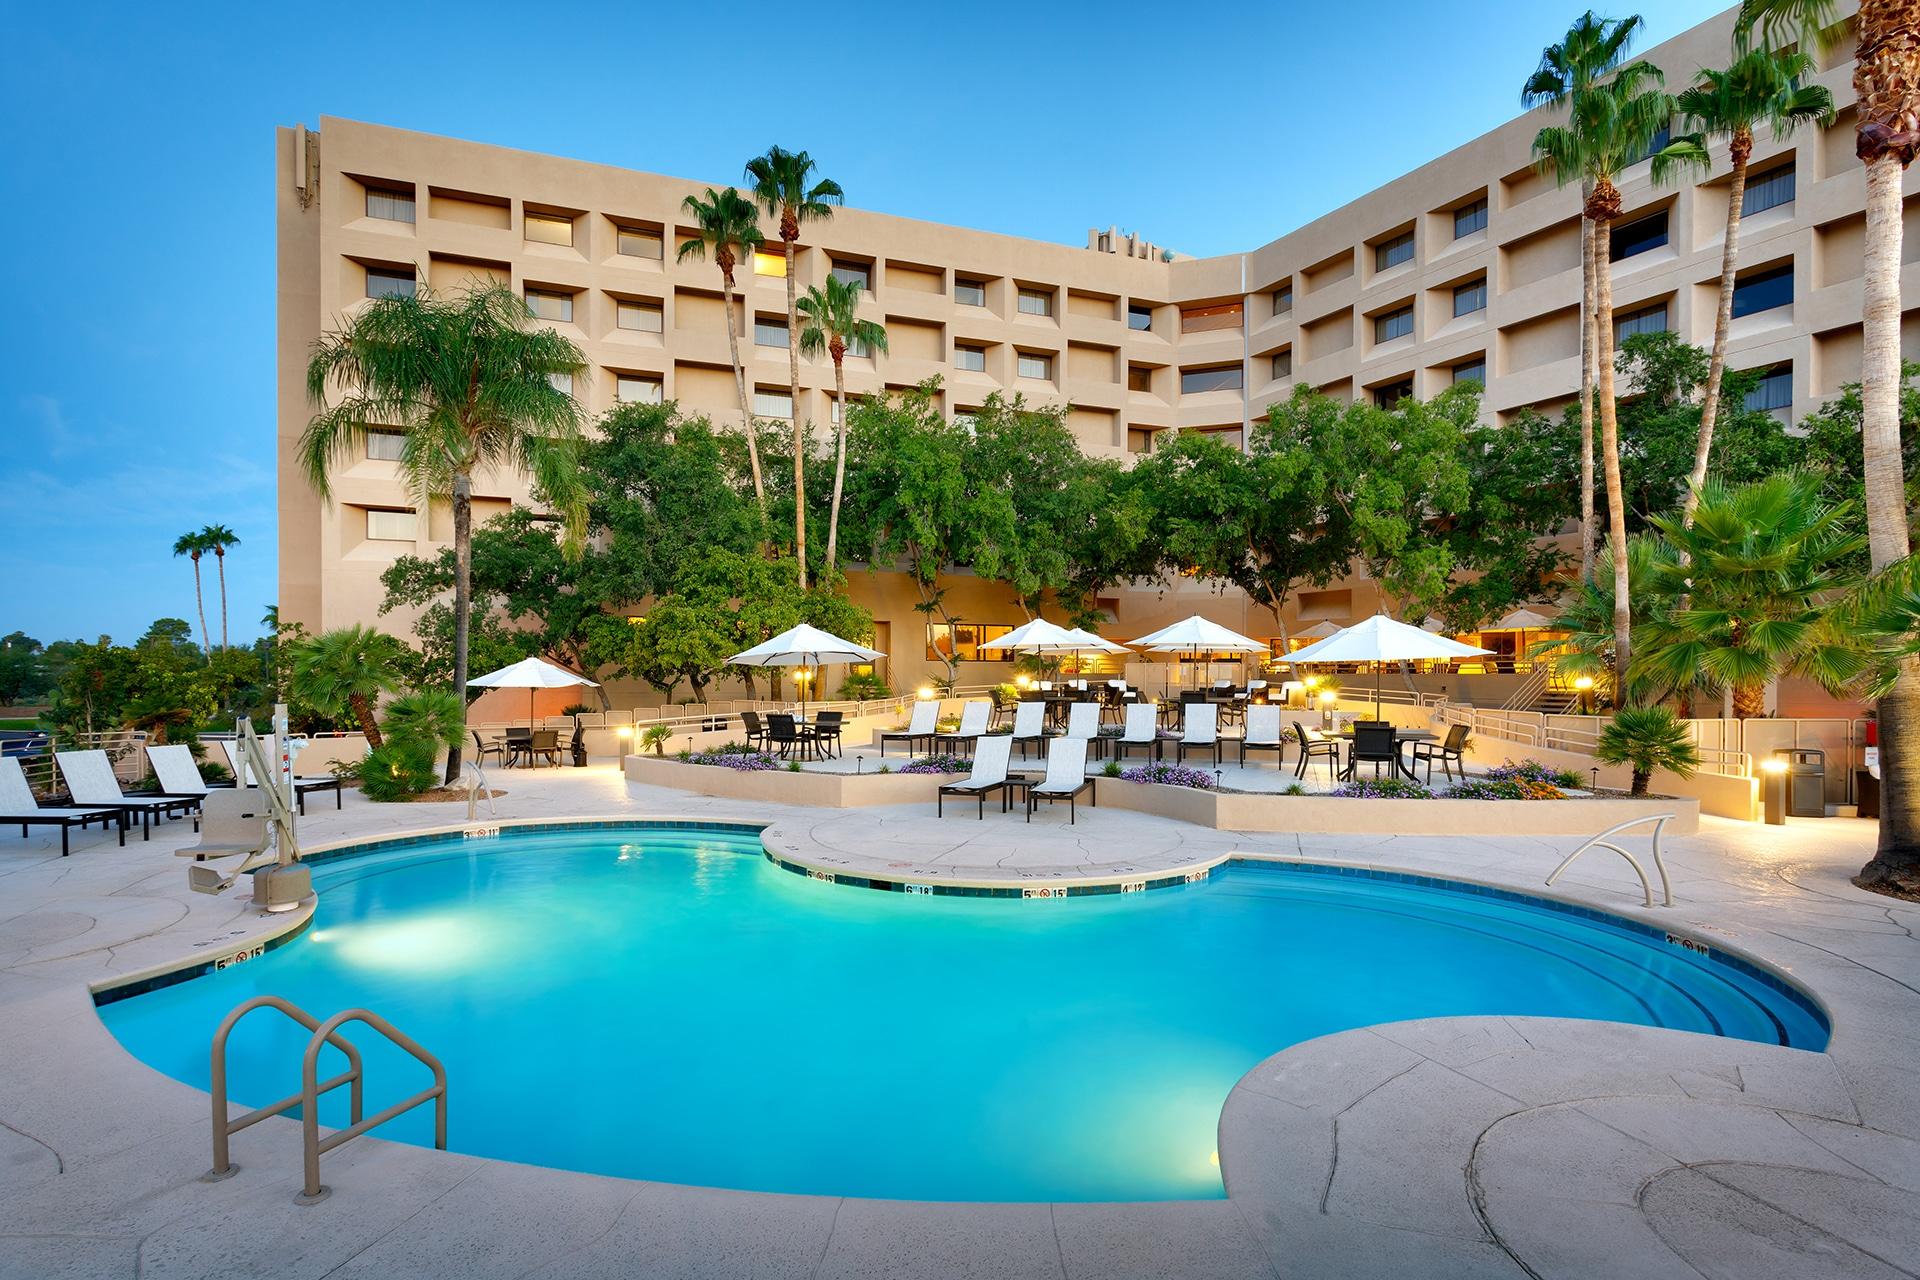 Hilton_Tucson_East_05022019_Darlene Heavlin - TUSHEHF-pool-03_web